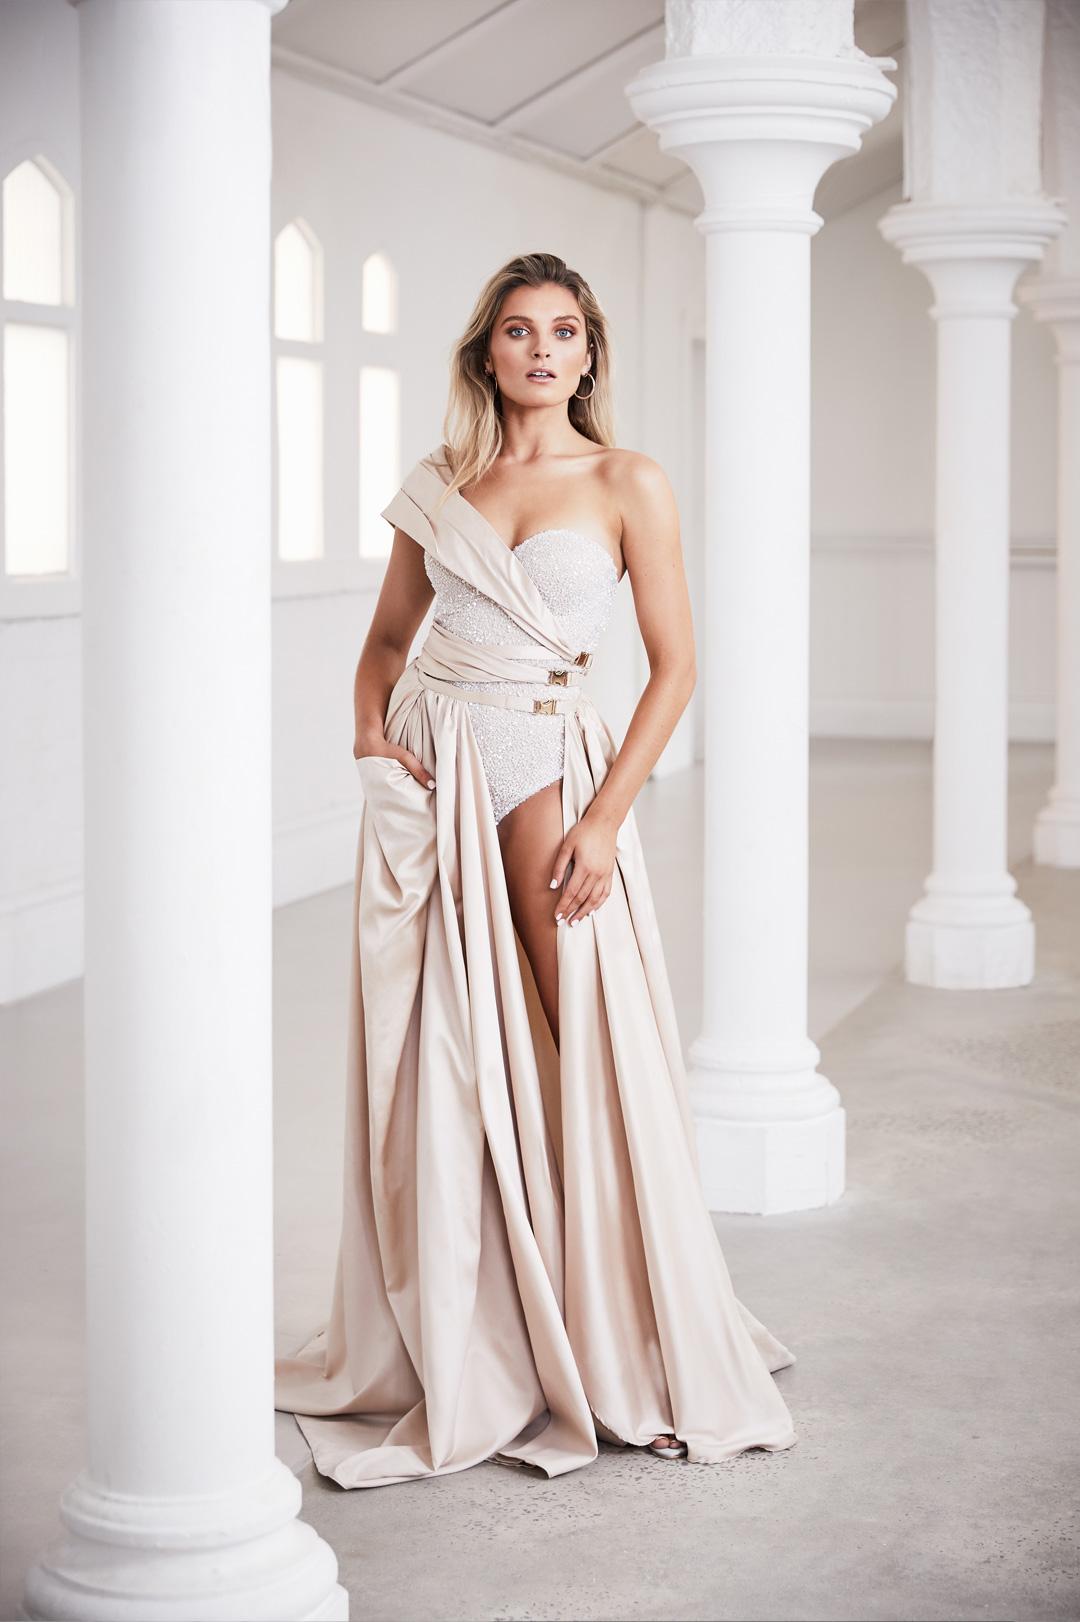 Deborah-Selleck-Couture-portrait-front-tribute-to-versace.jpg